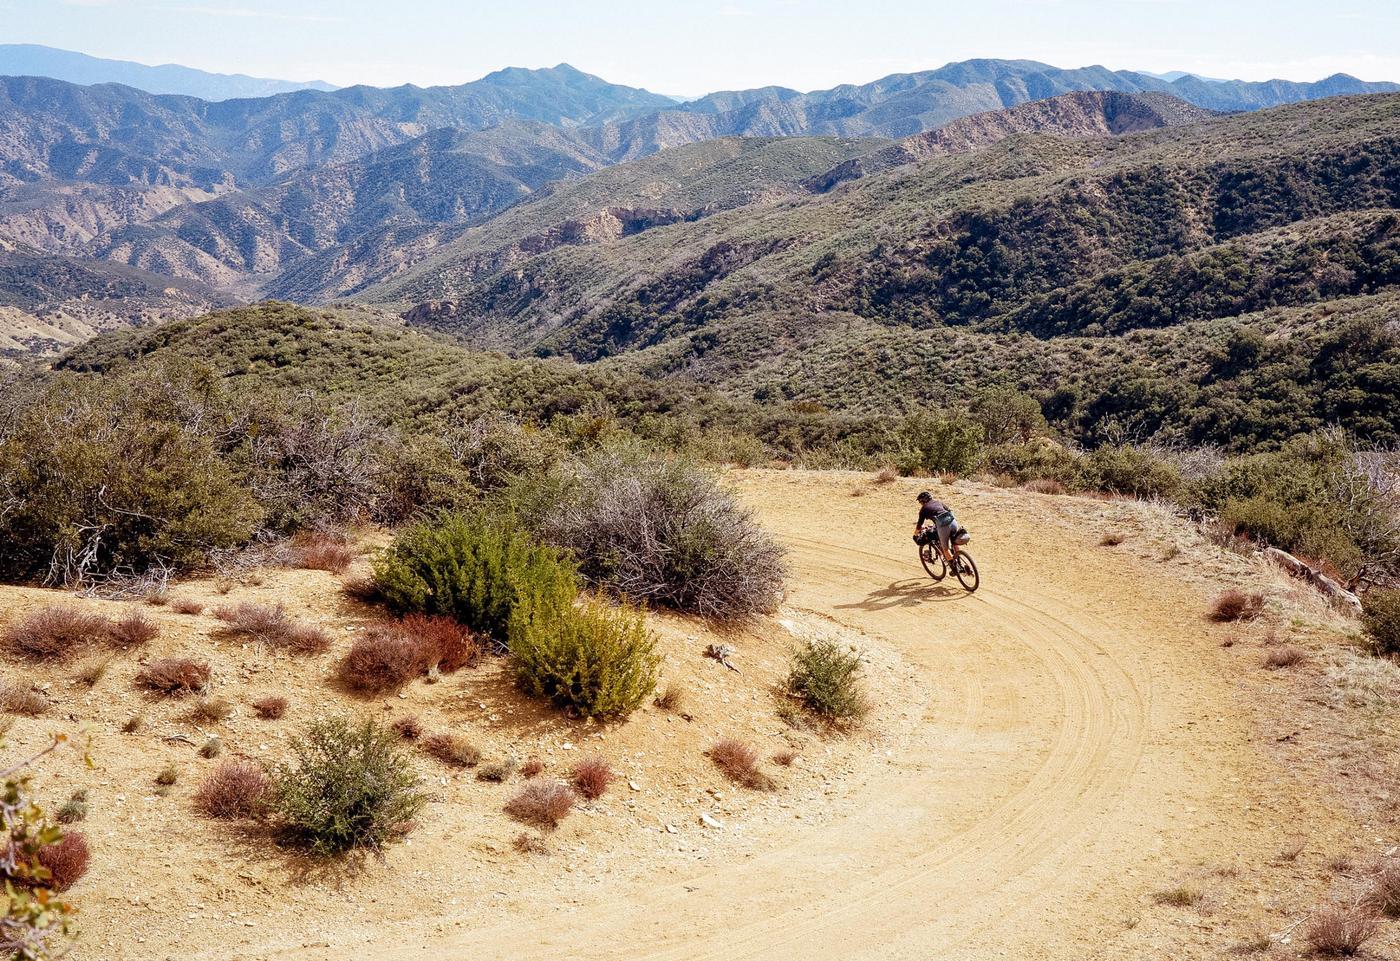 High Steep Broken Mountains: Riding in Threatened Central California Coast Public Land